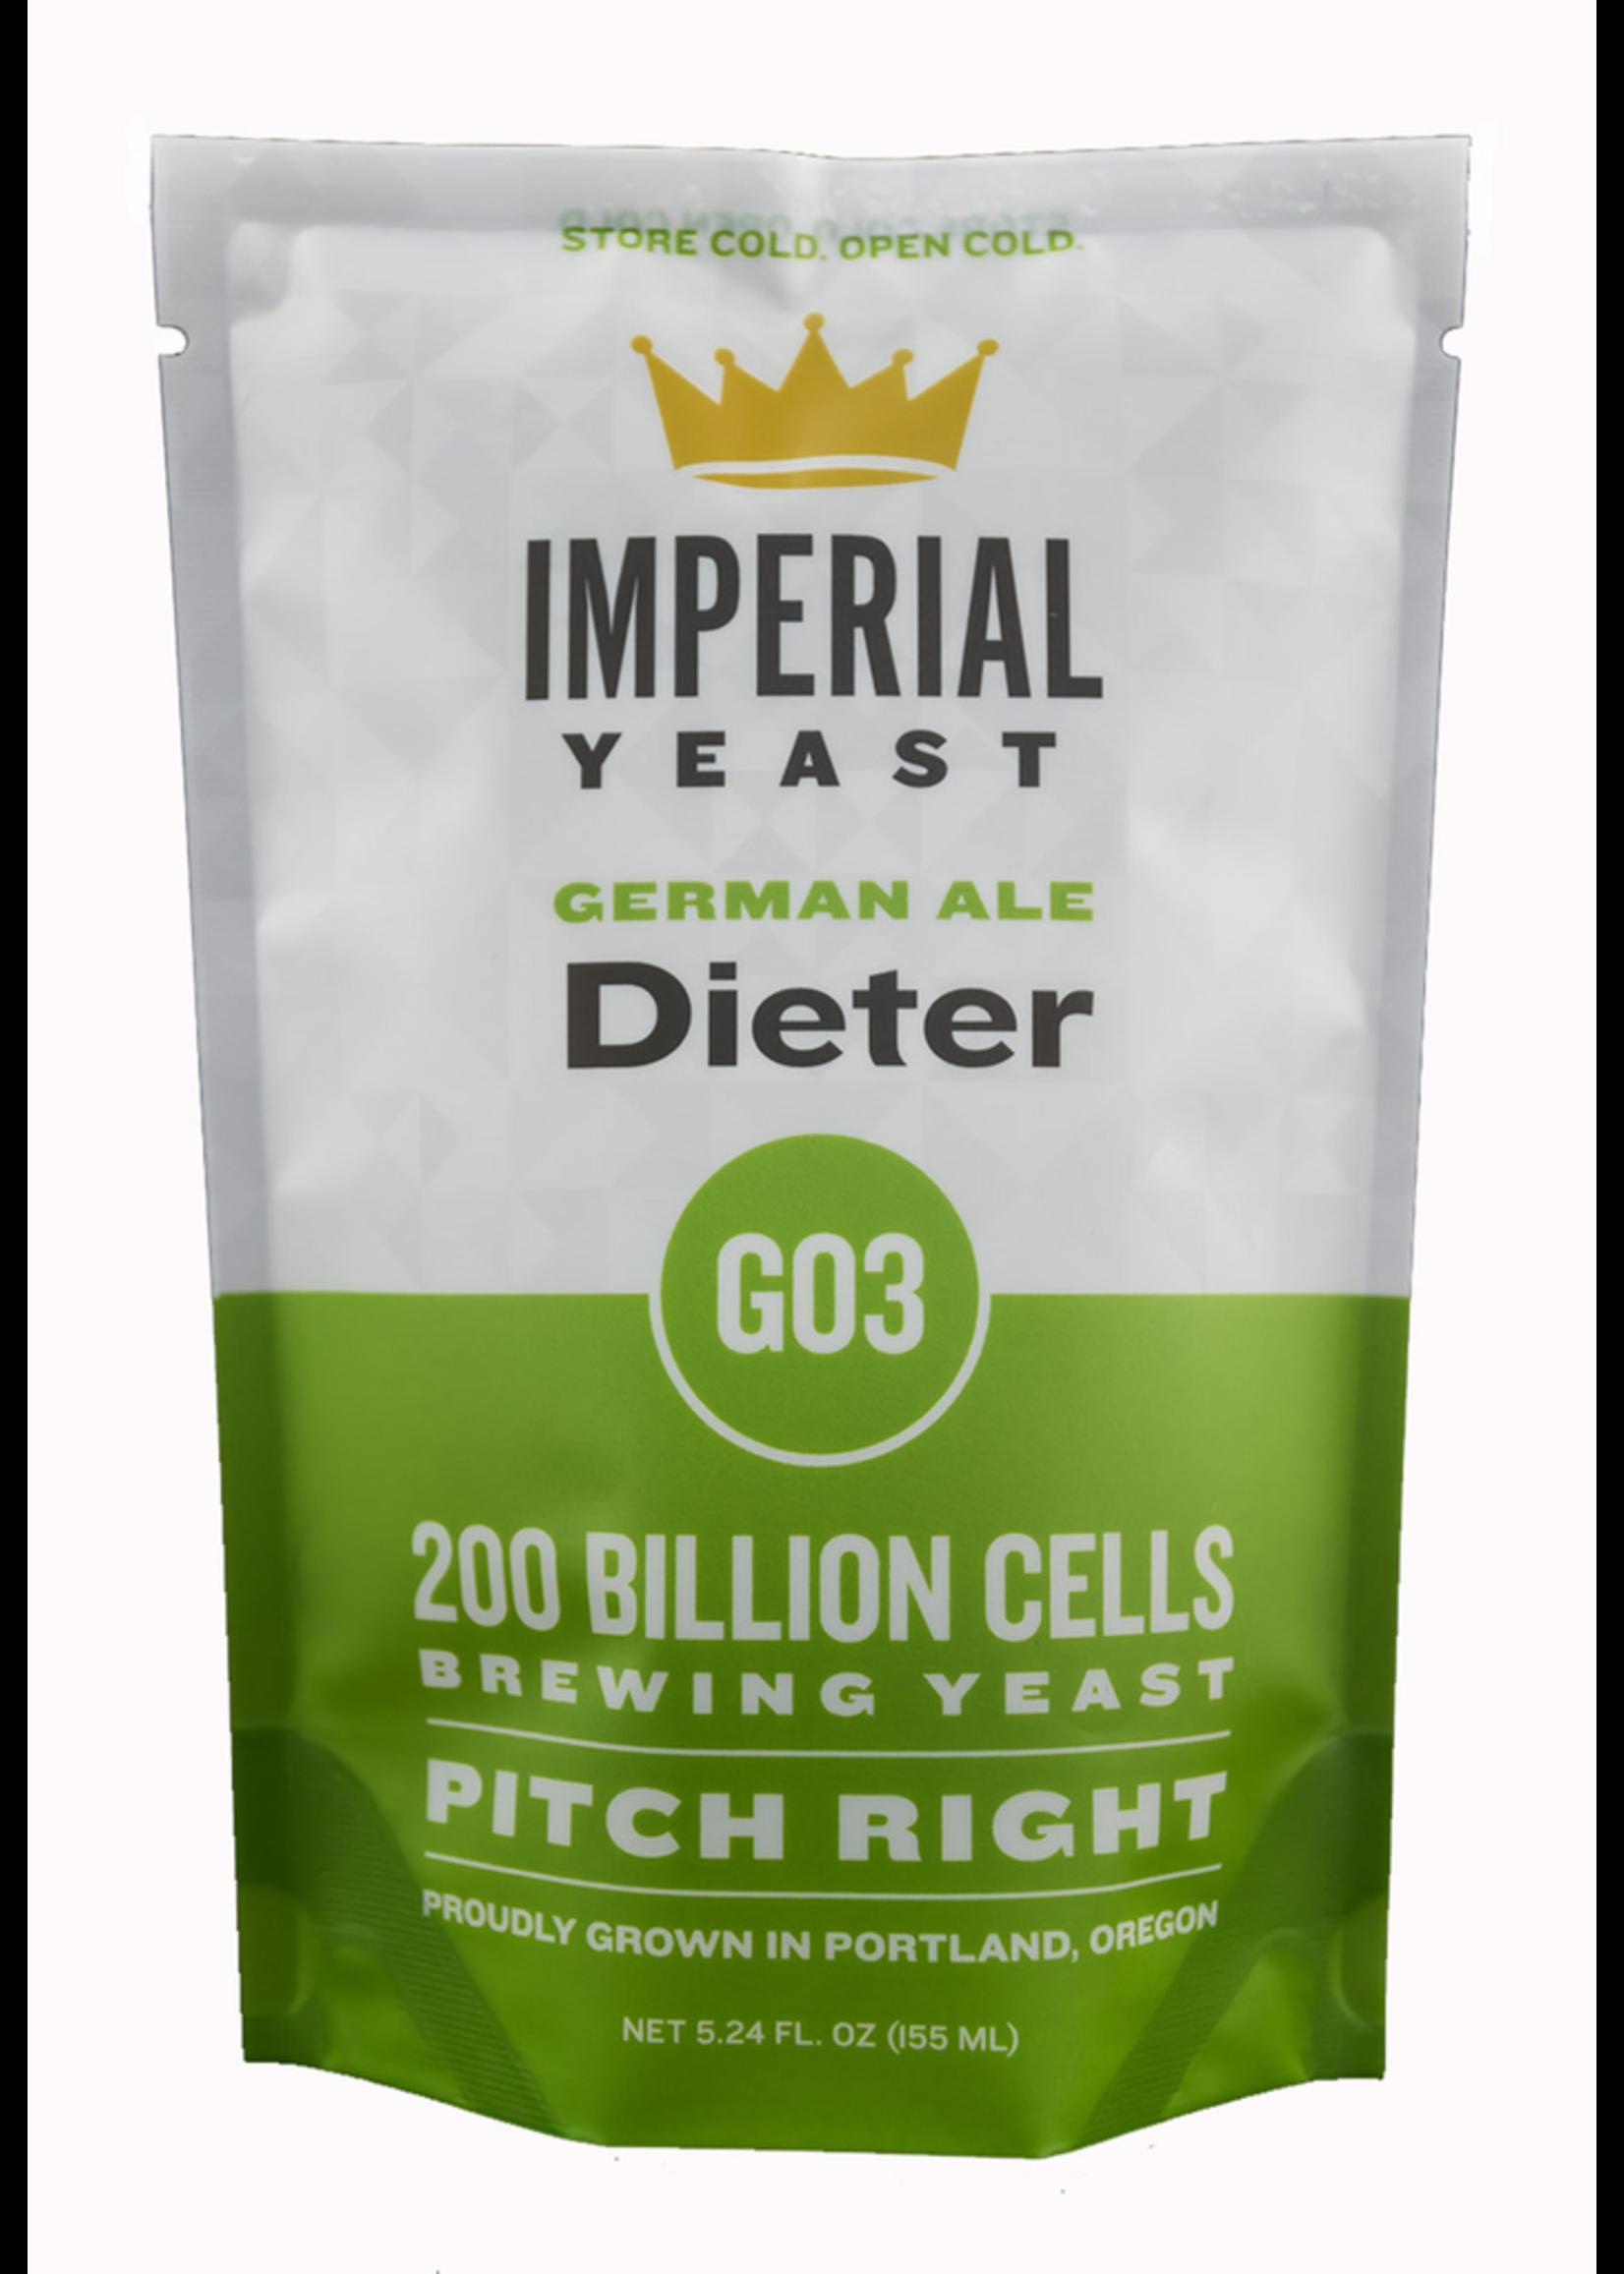 Yeast Imperial Organic Yeast G03 - Dieter